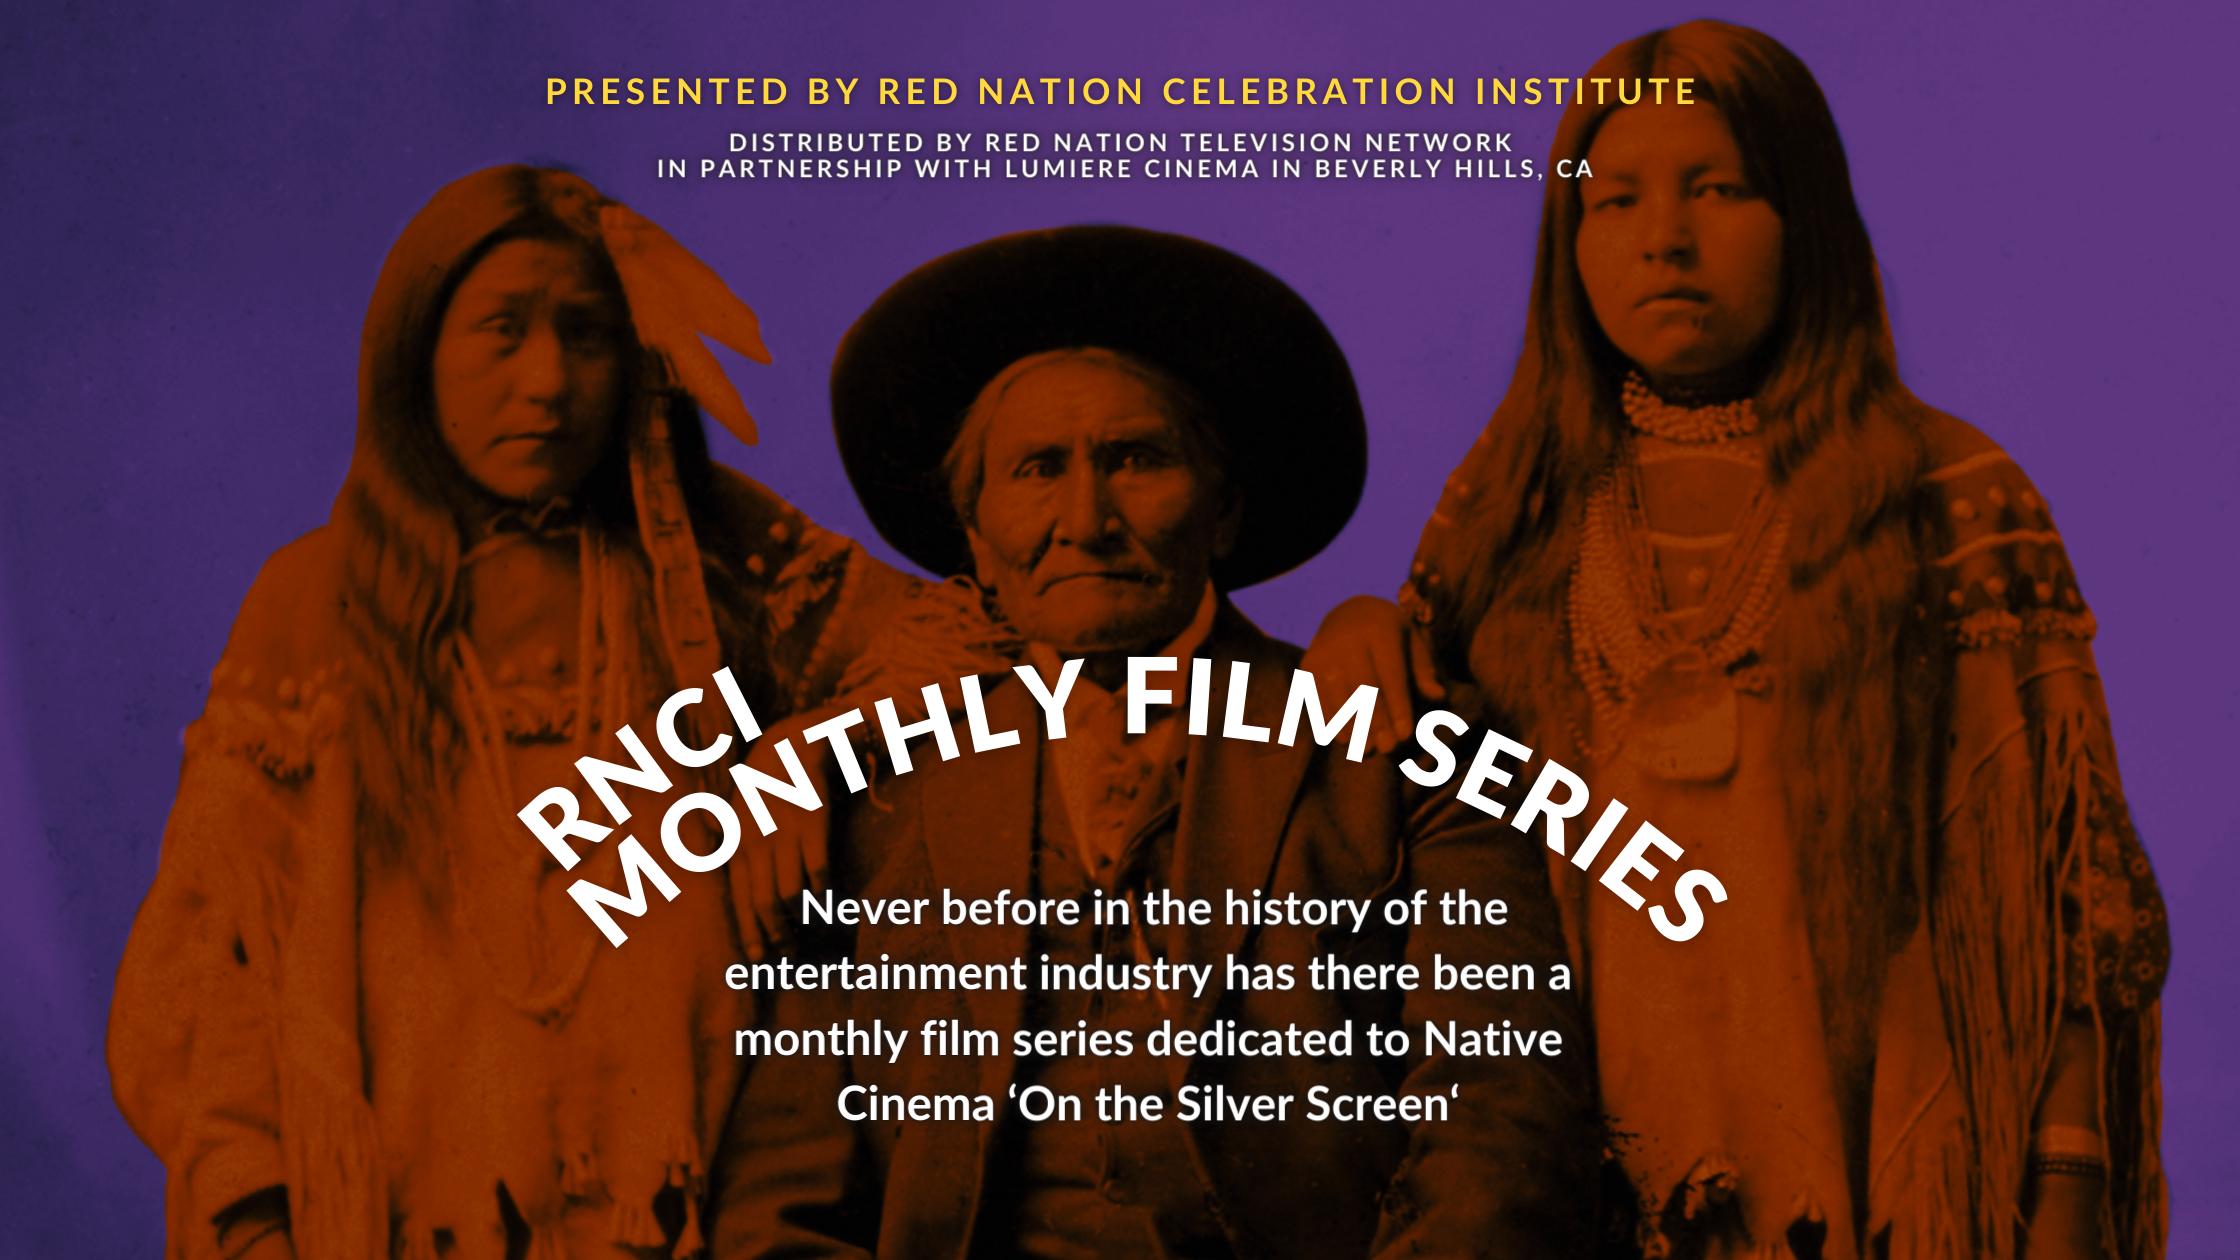 RNCI-Monthly Film Series-2240x1260px